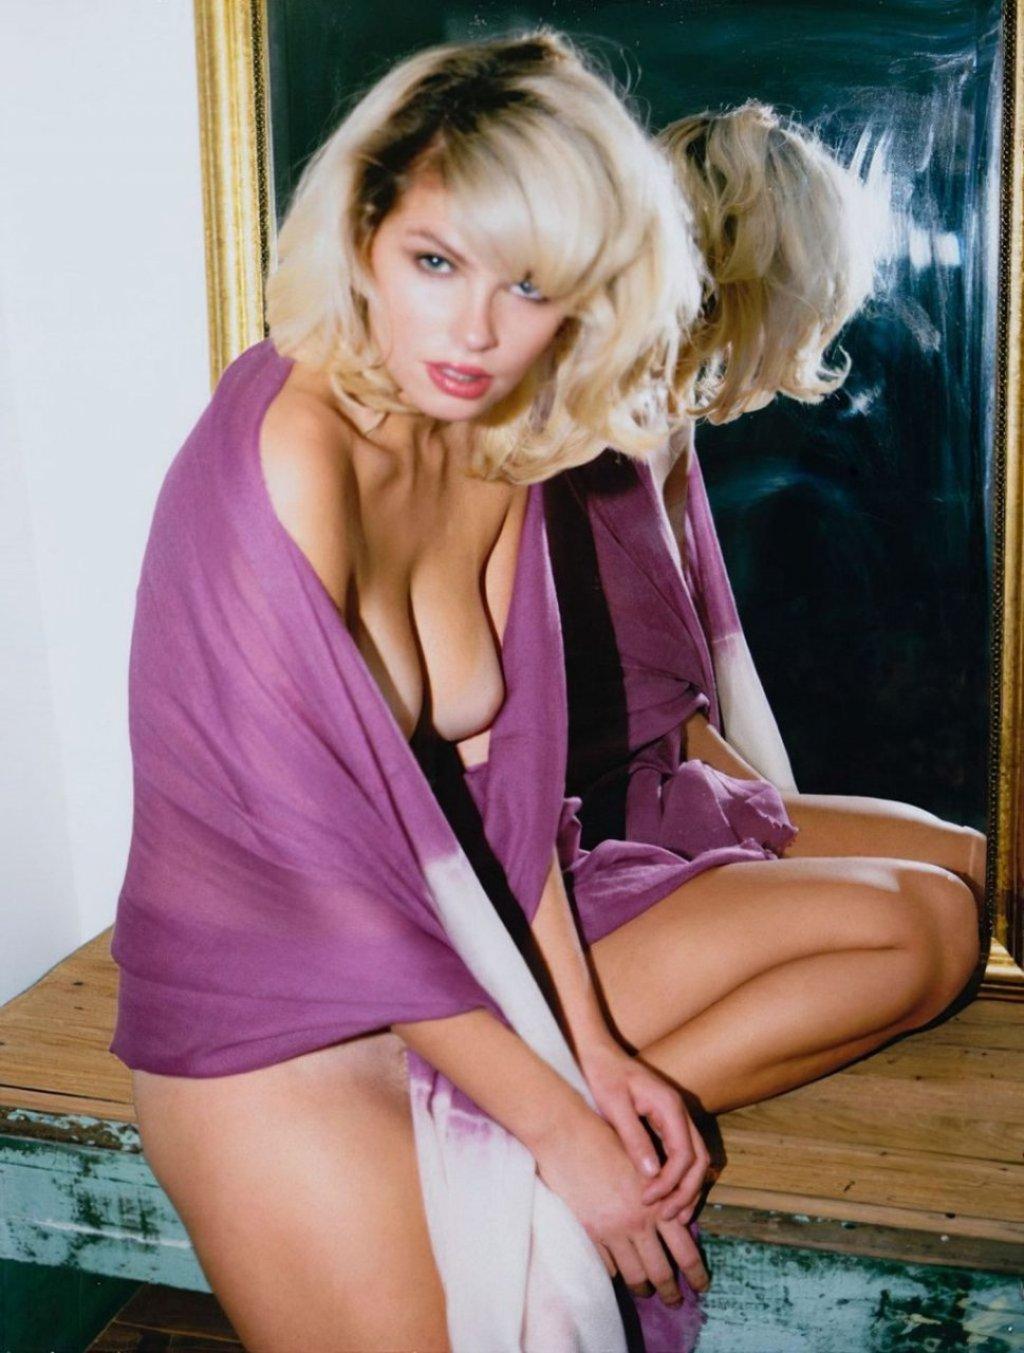 Nola Palmer Nude Ultimate Compilation (85 Photos + Video)